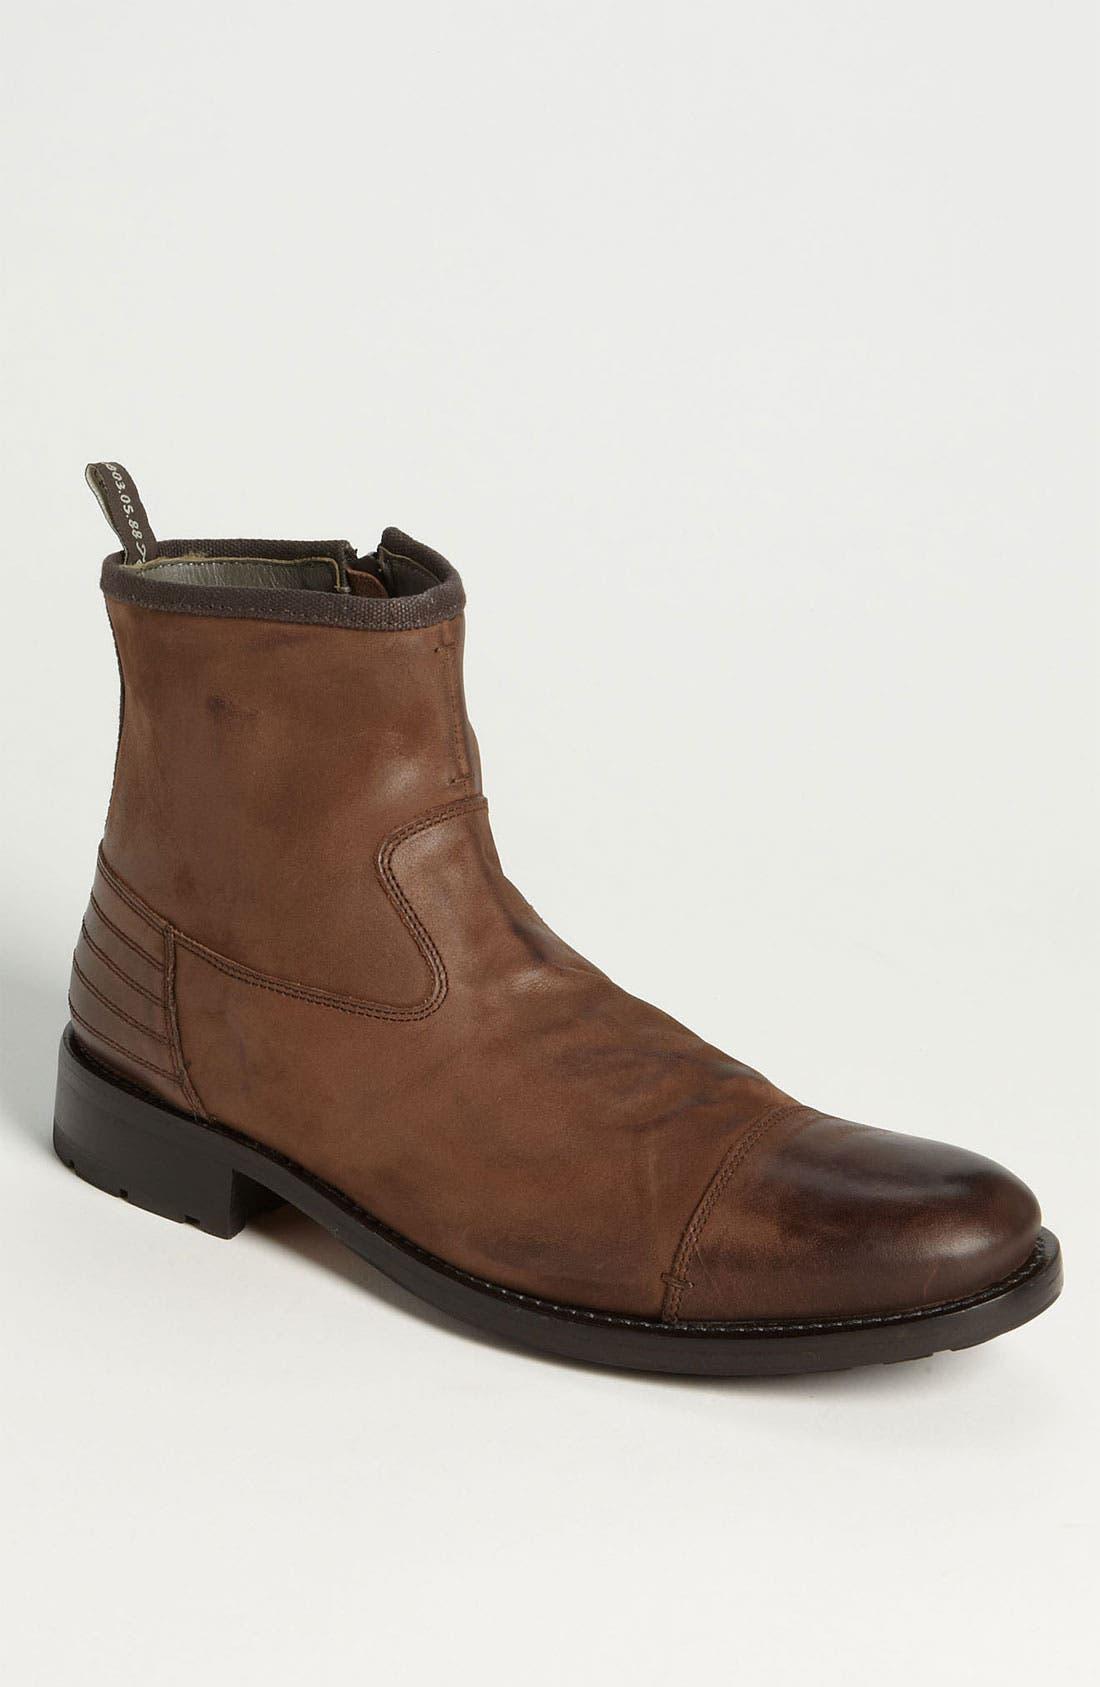 Alternate Image 1 Selected - Ted Baker London 'Abanet' Boot